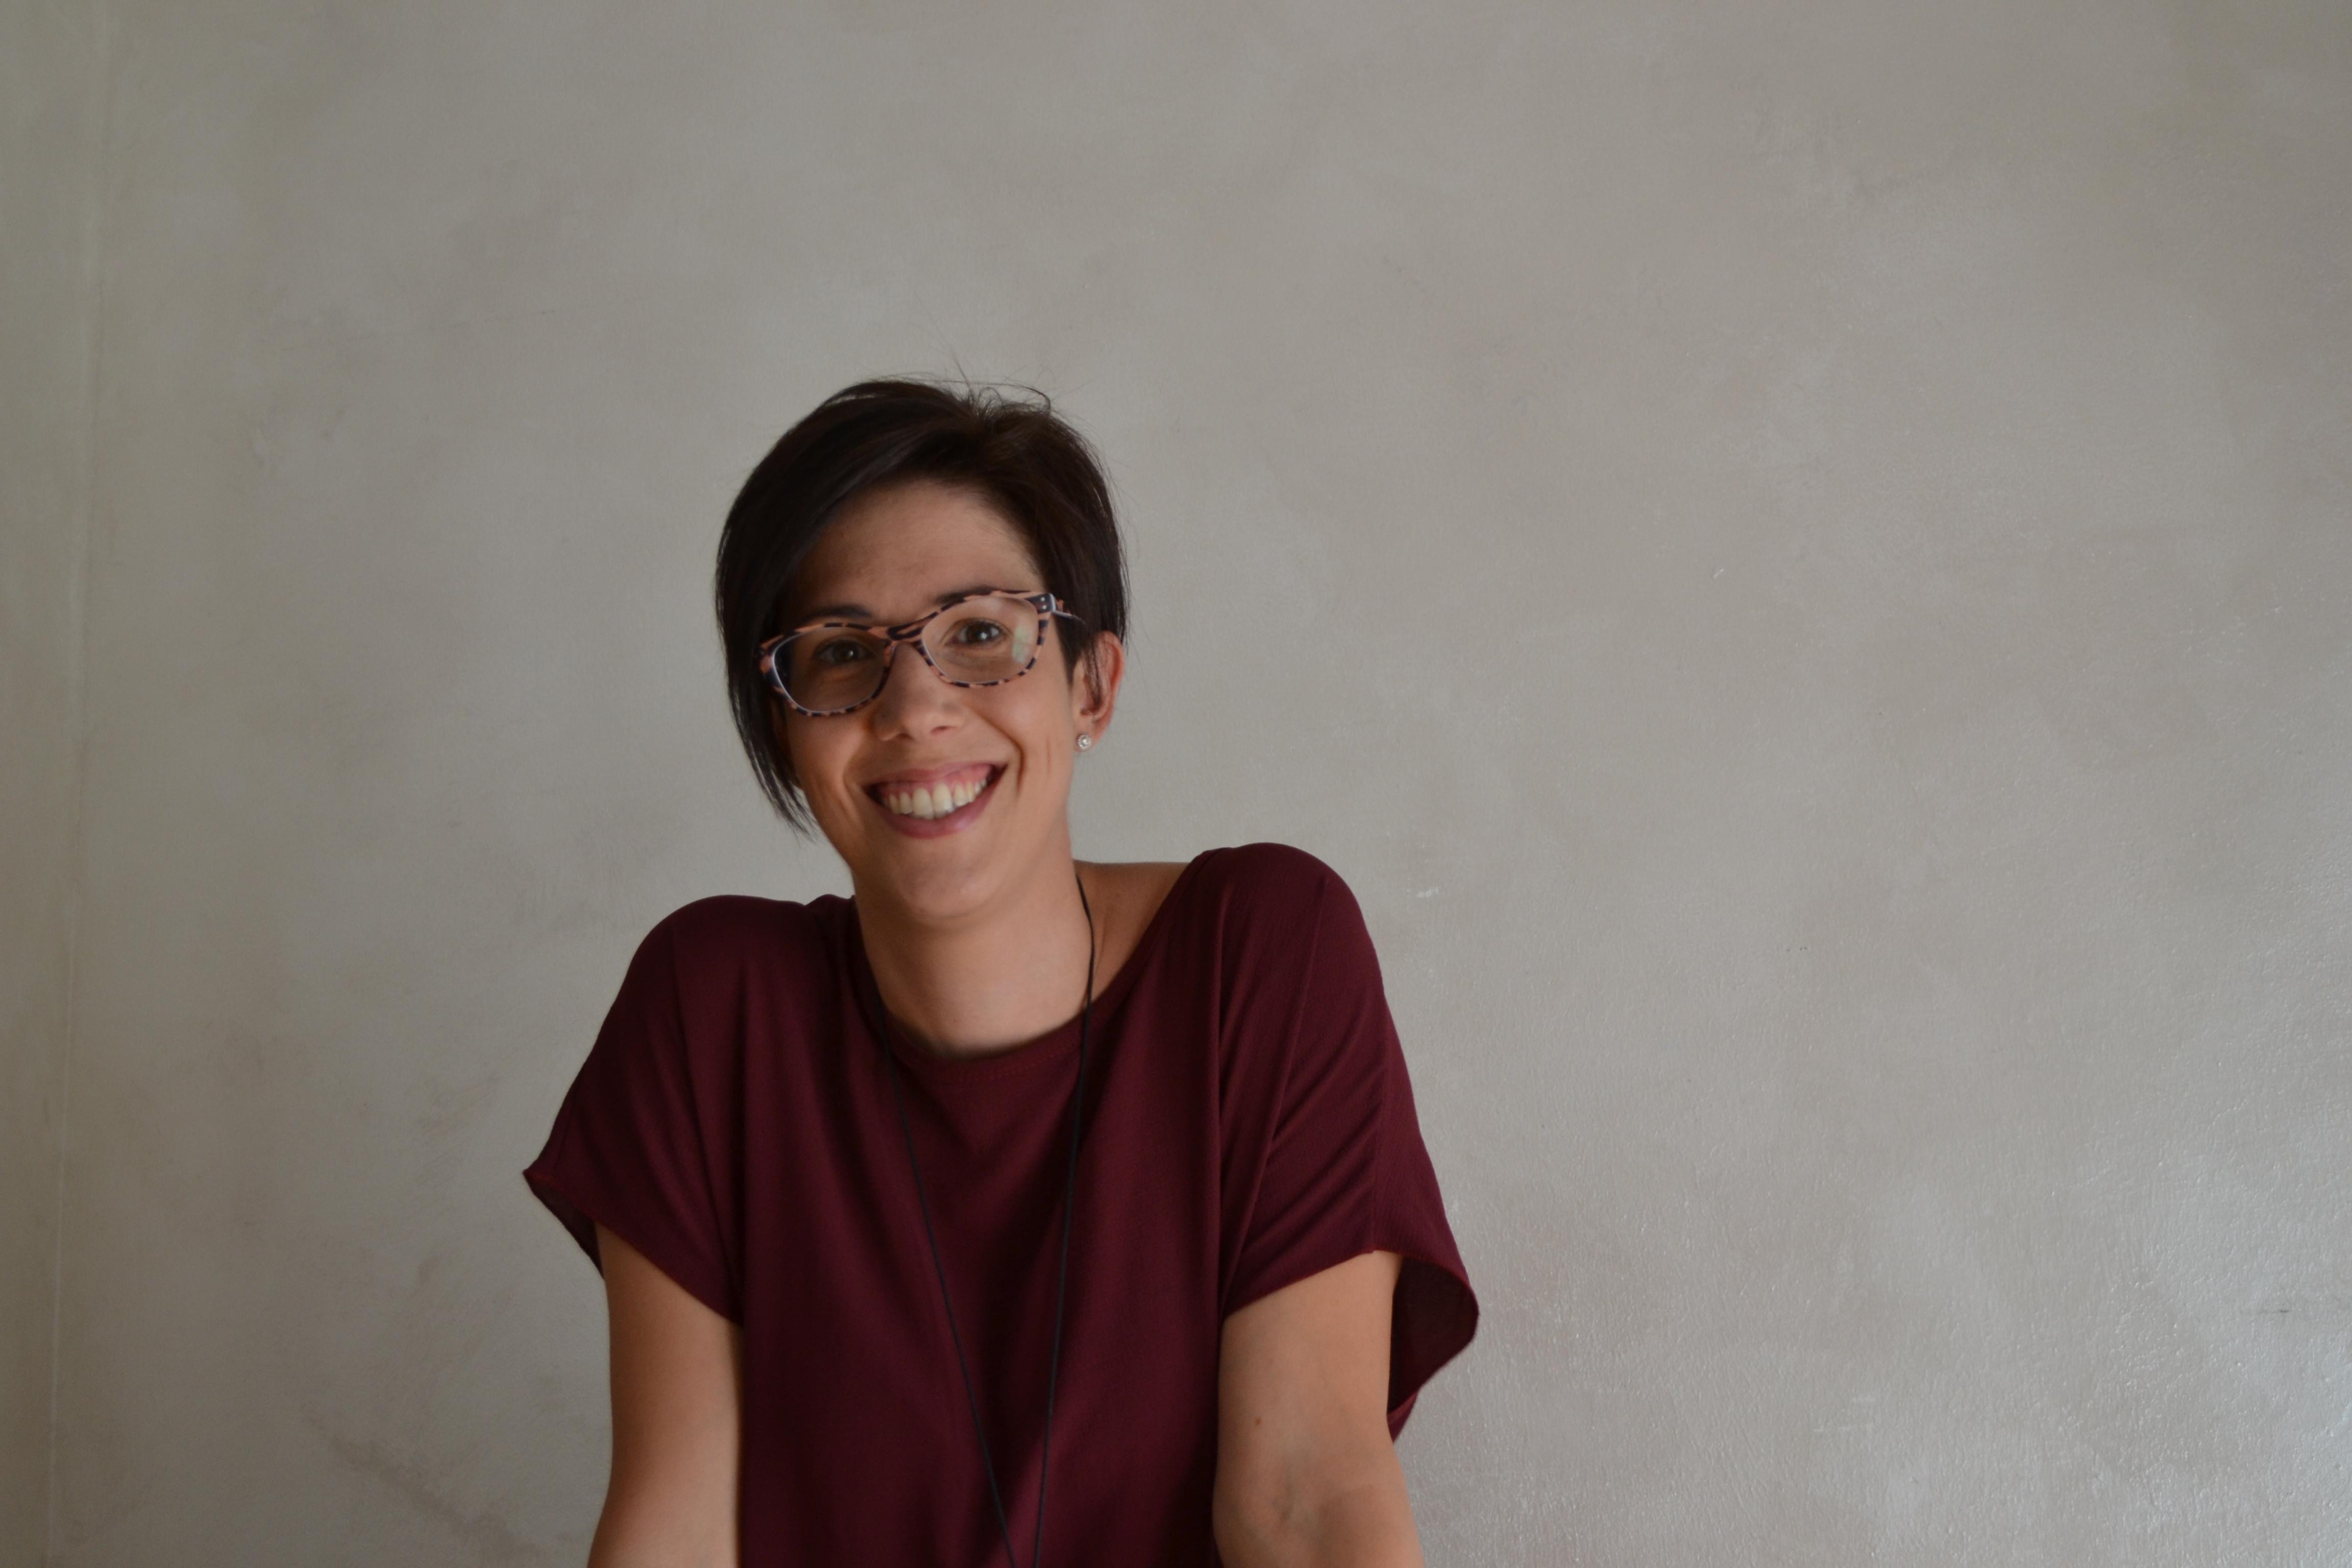 Giorgia Sorinelli